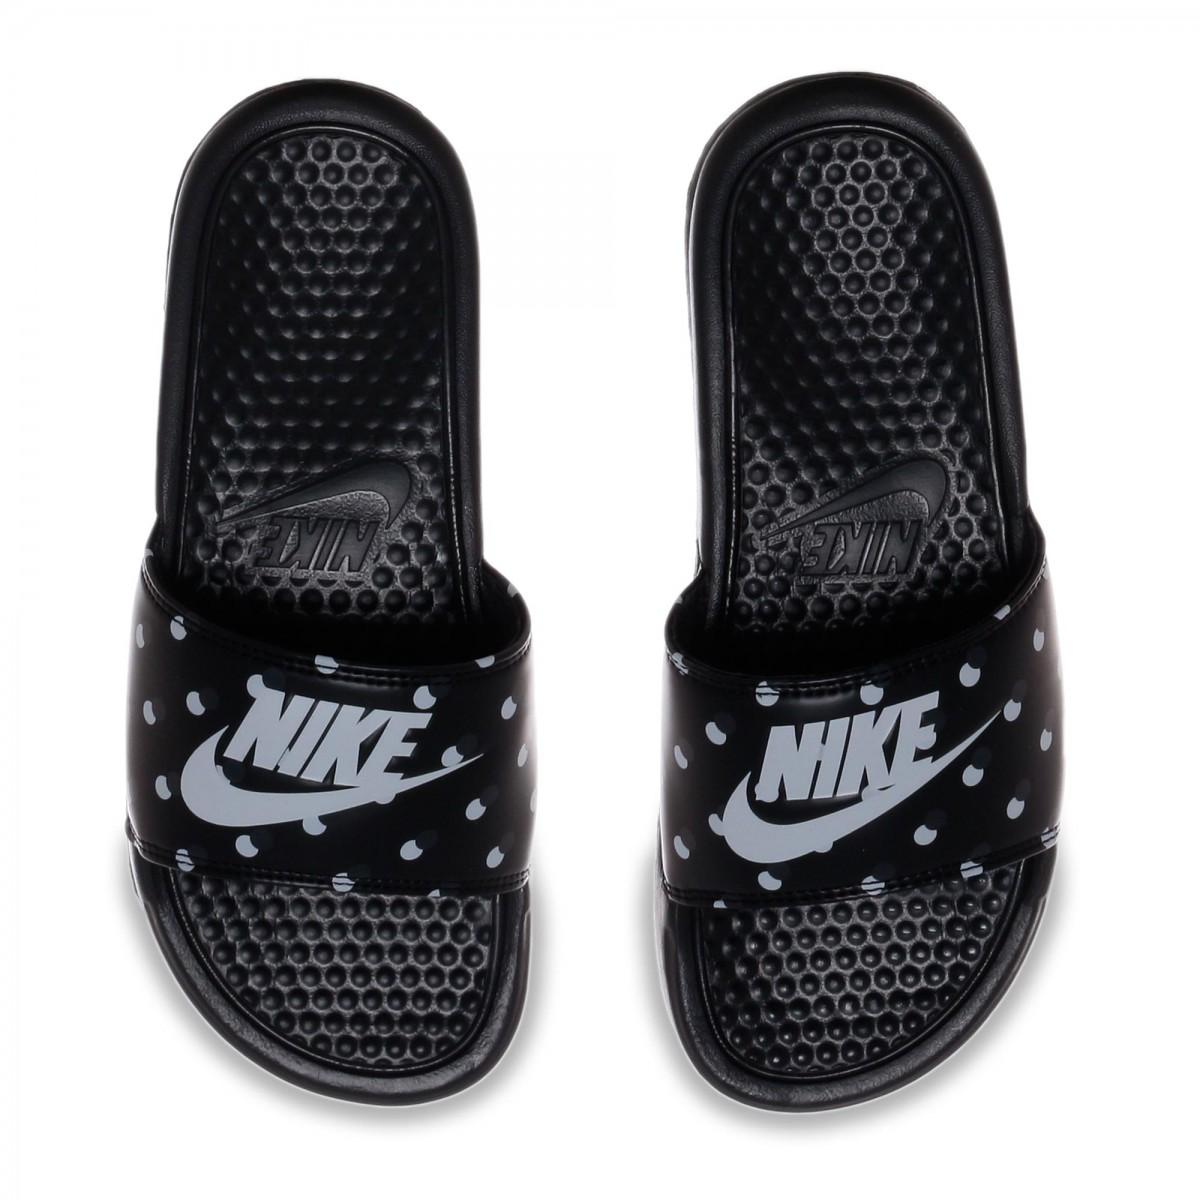 a7bae2f52a Sandália Nike WMNS Benassi JDI Print Feminina 618919-007 - Preto ...